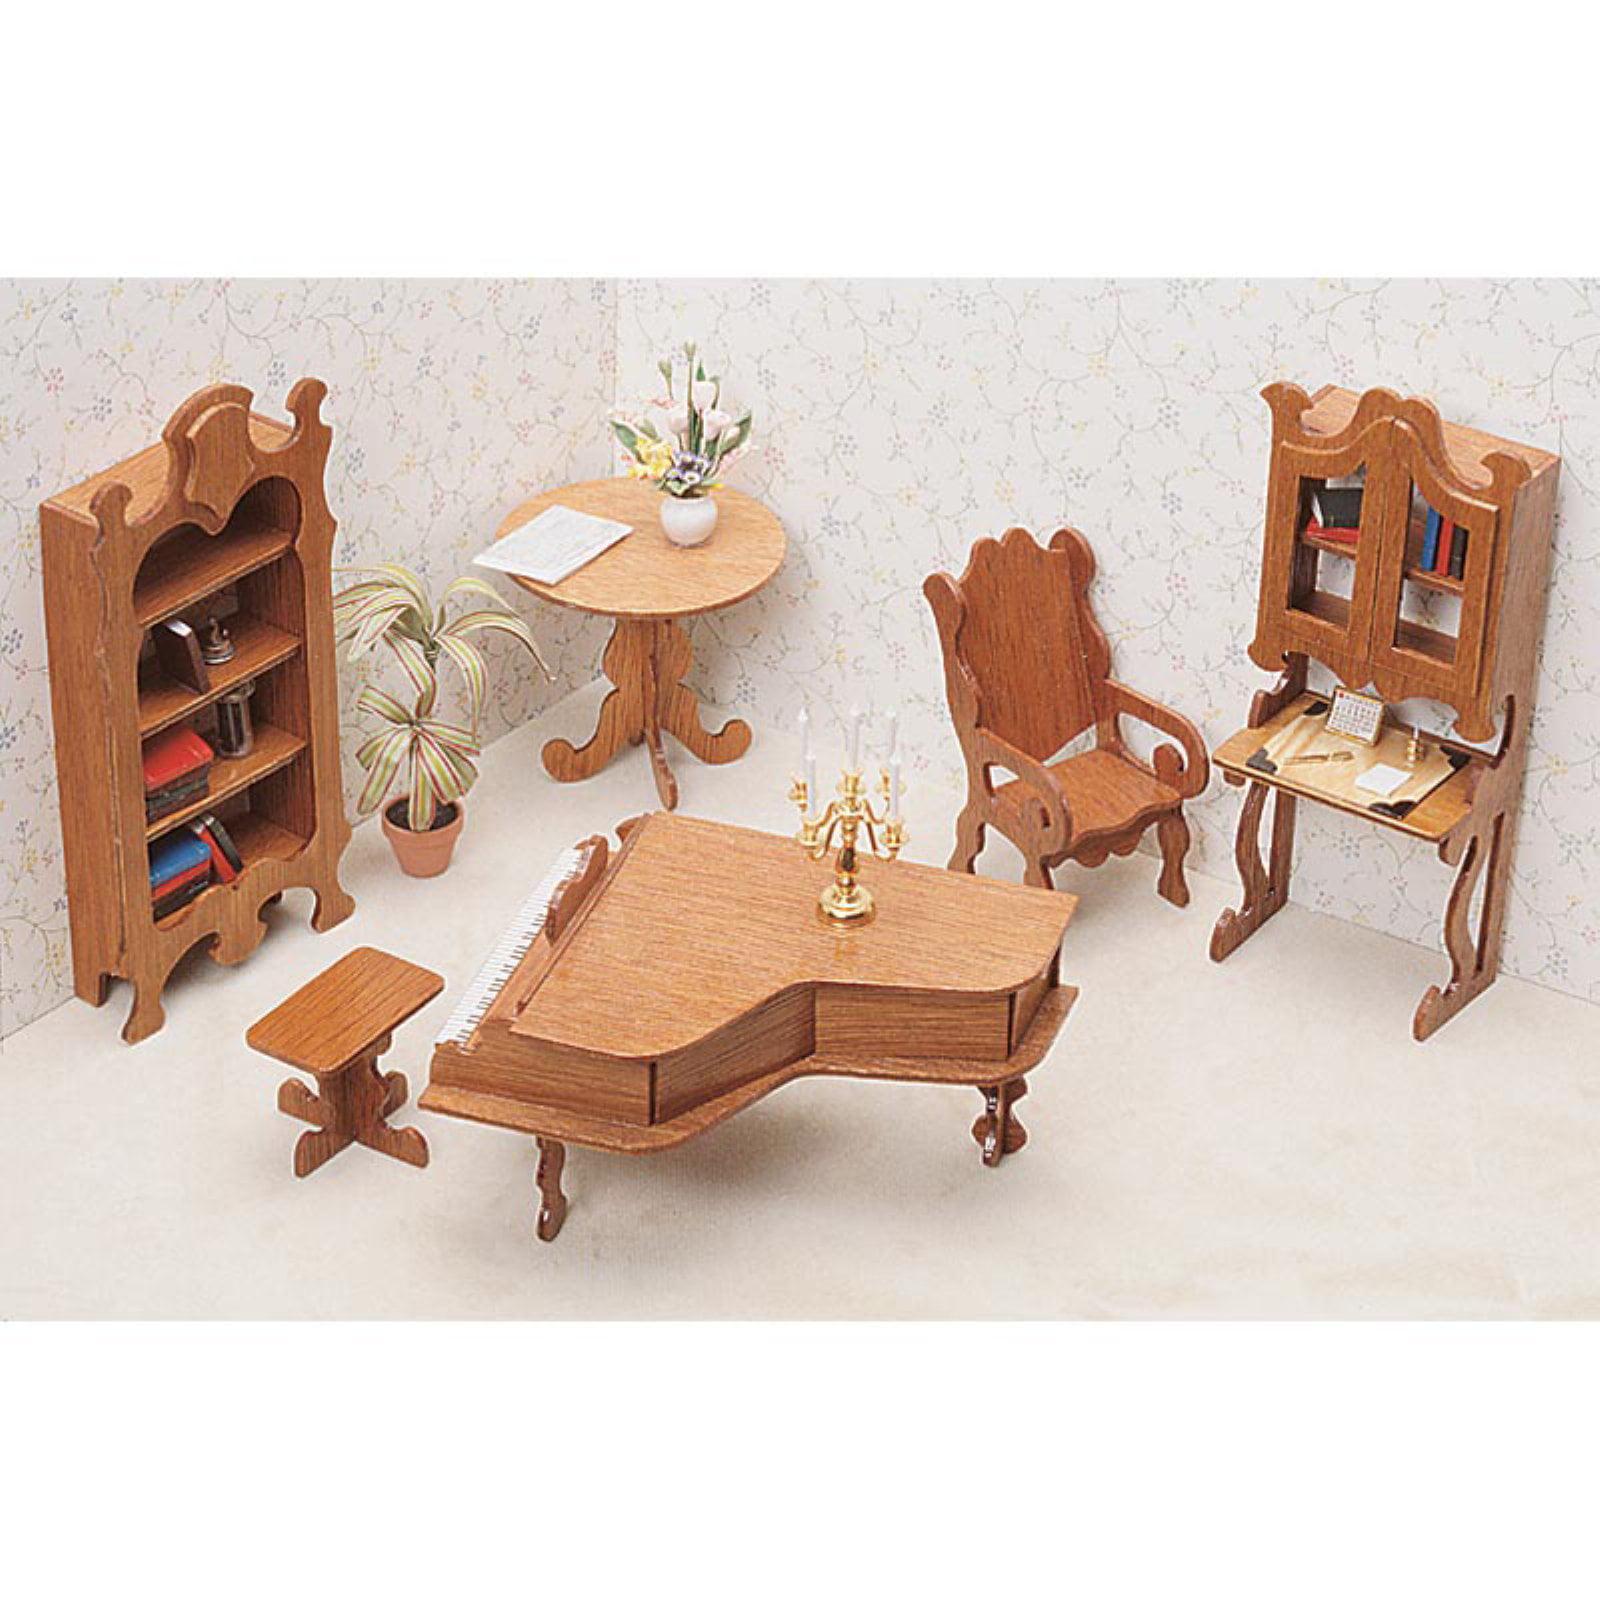 Greenleaf Library Furniture Kit Set - 1 Inch Scale